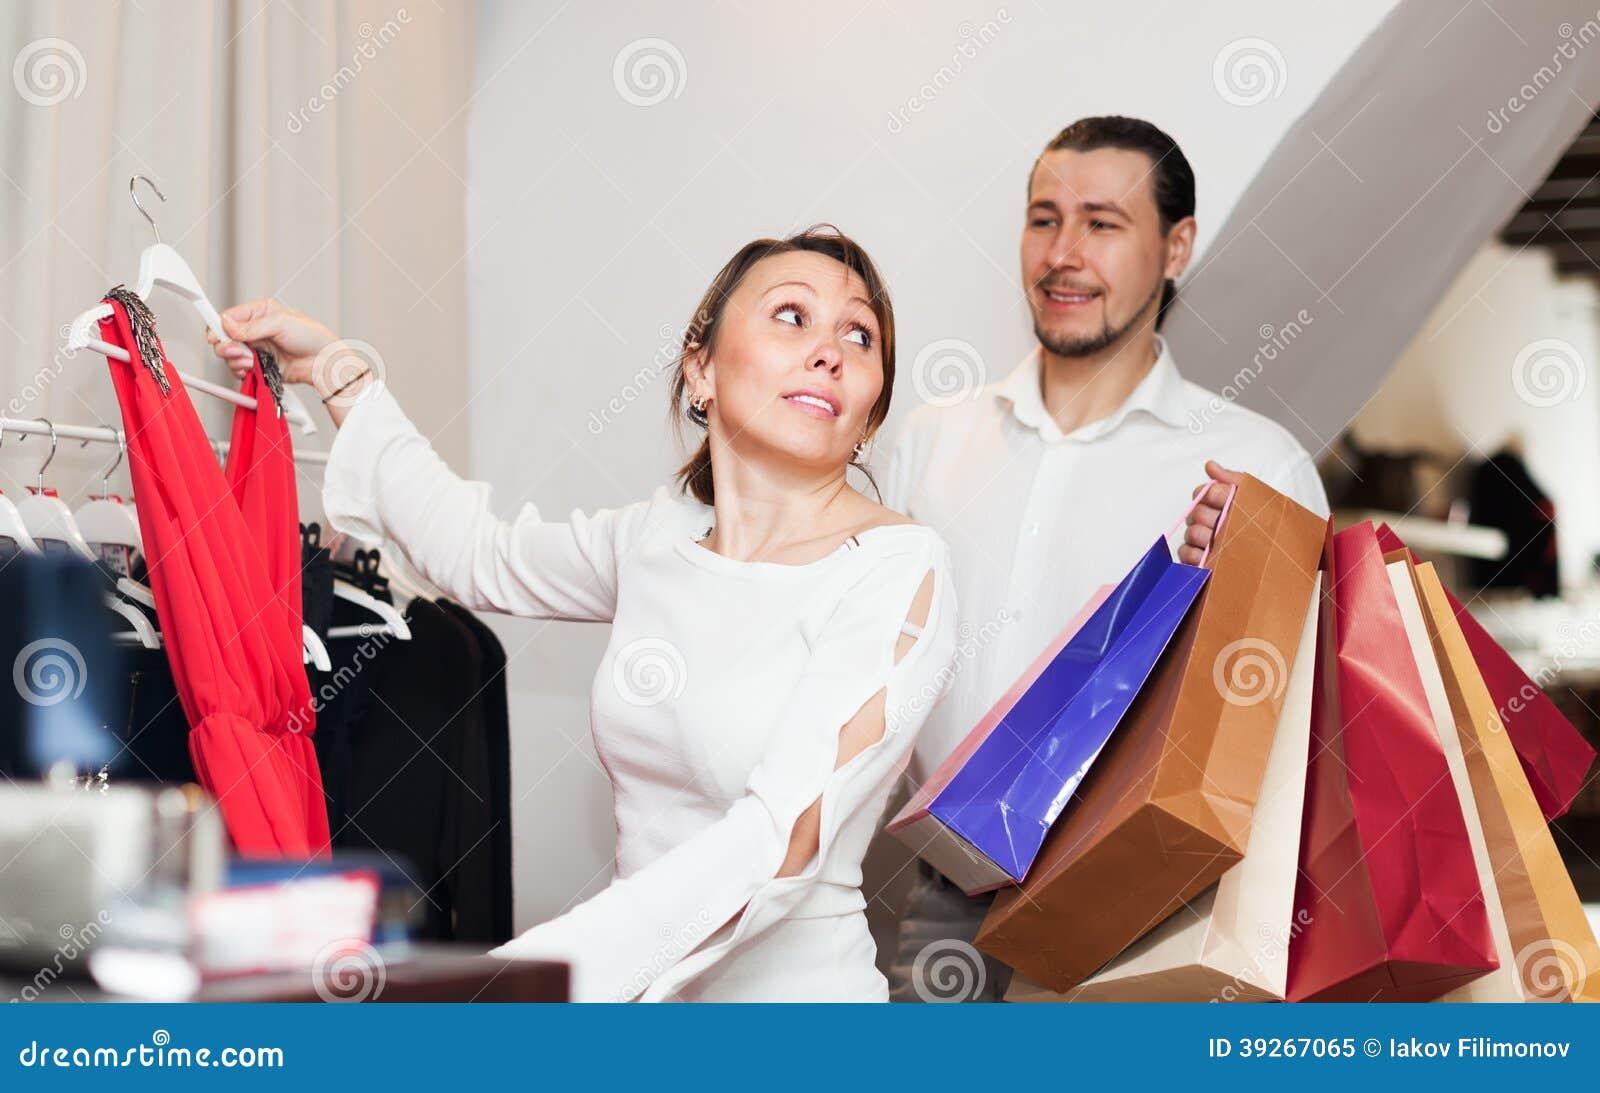 8a5fec8ba891 Woman Man Choosing Dress Clothing Shop Stock Images - Download 70 Royalty  Free Photos